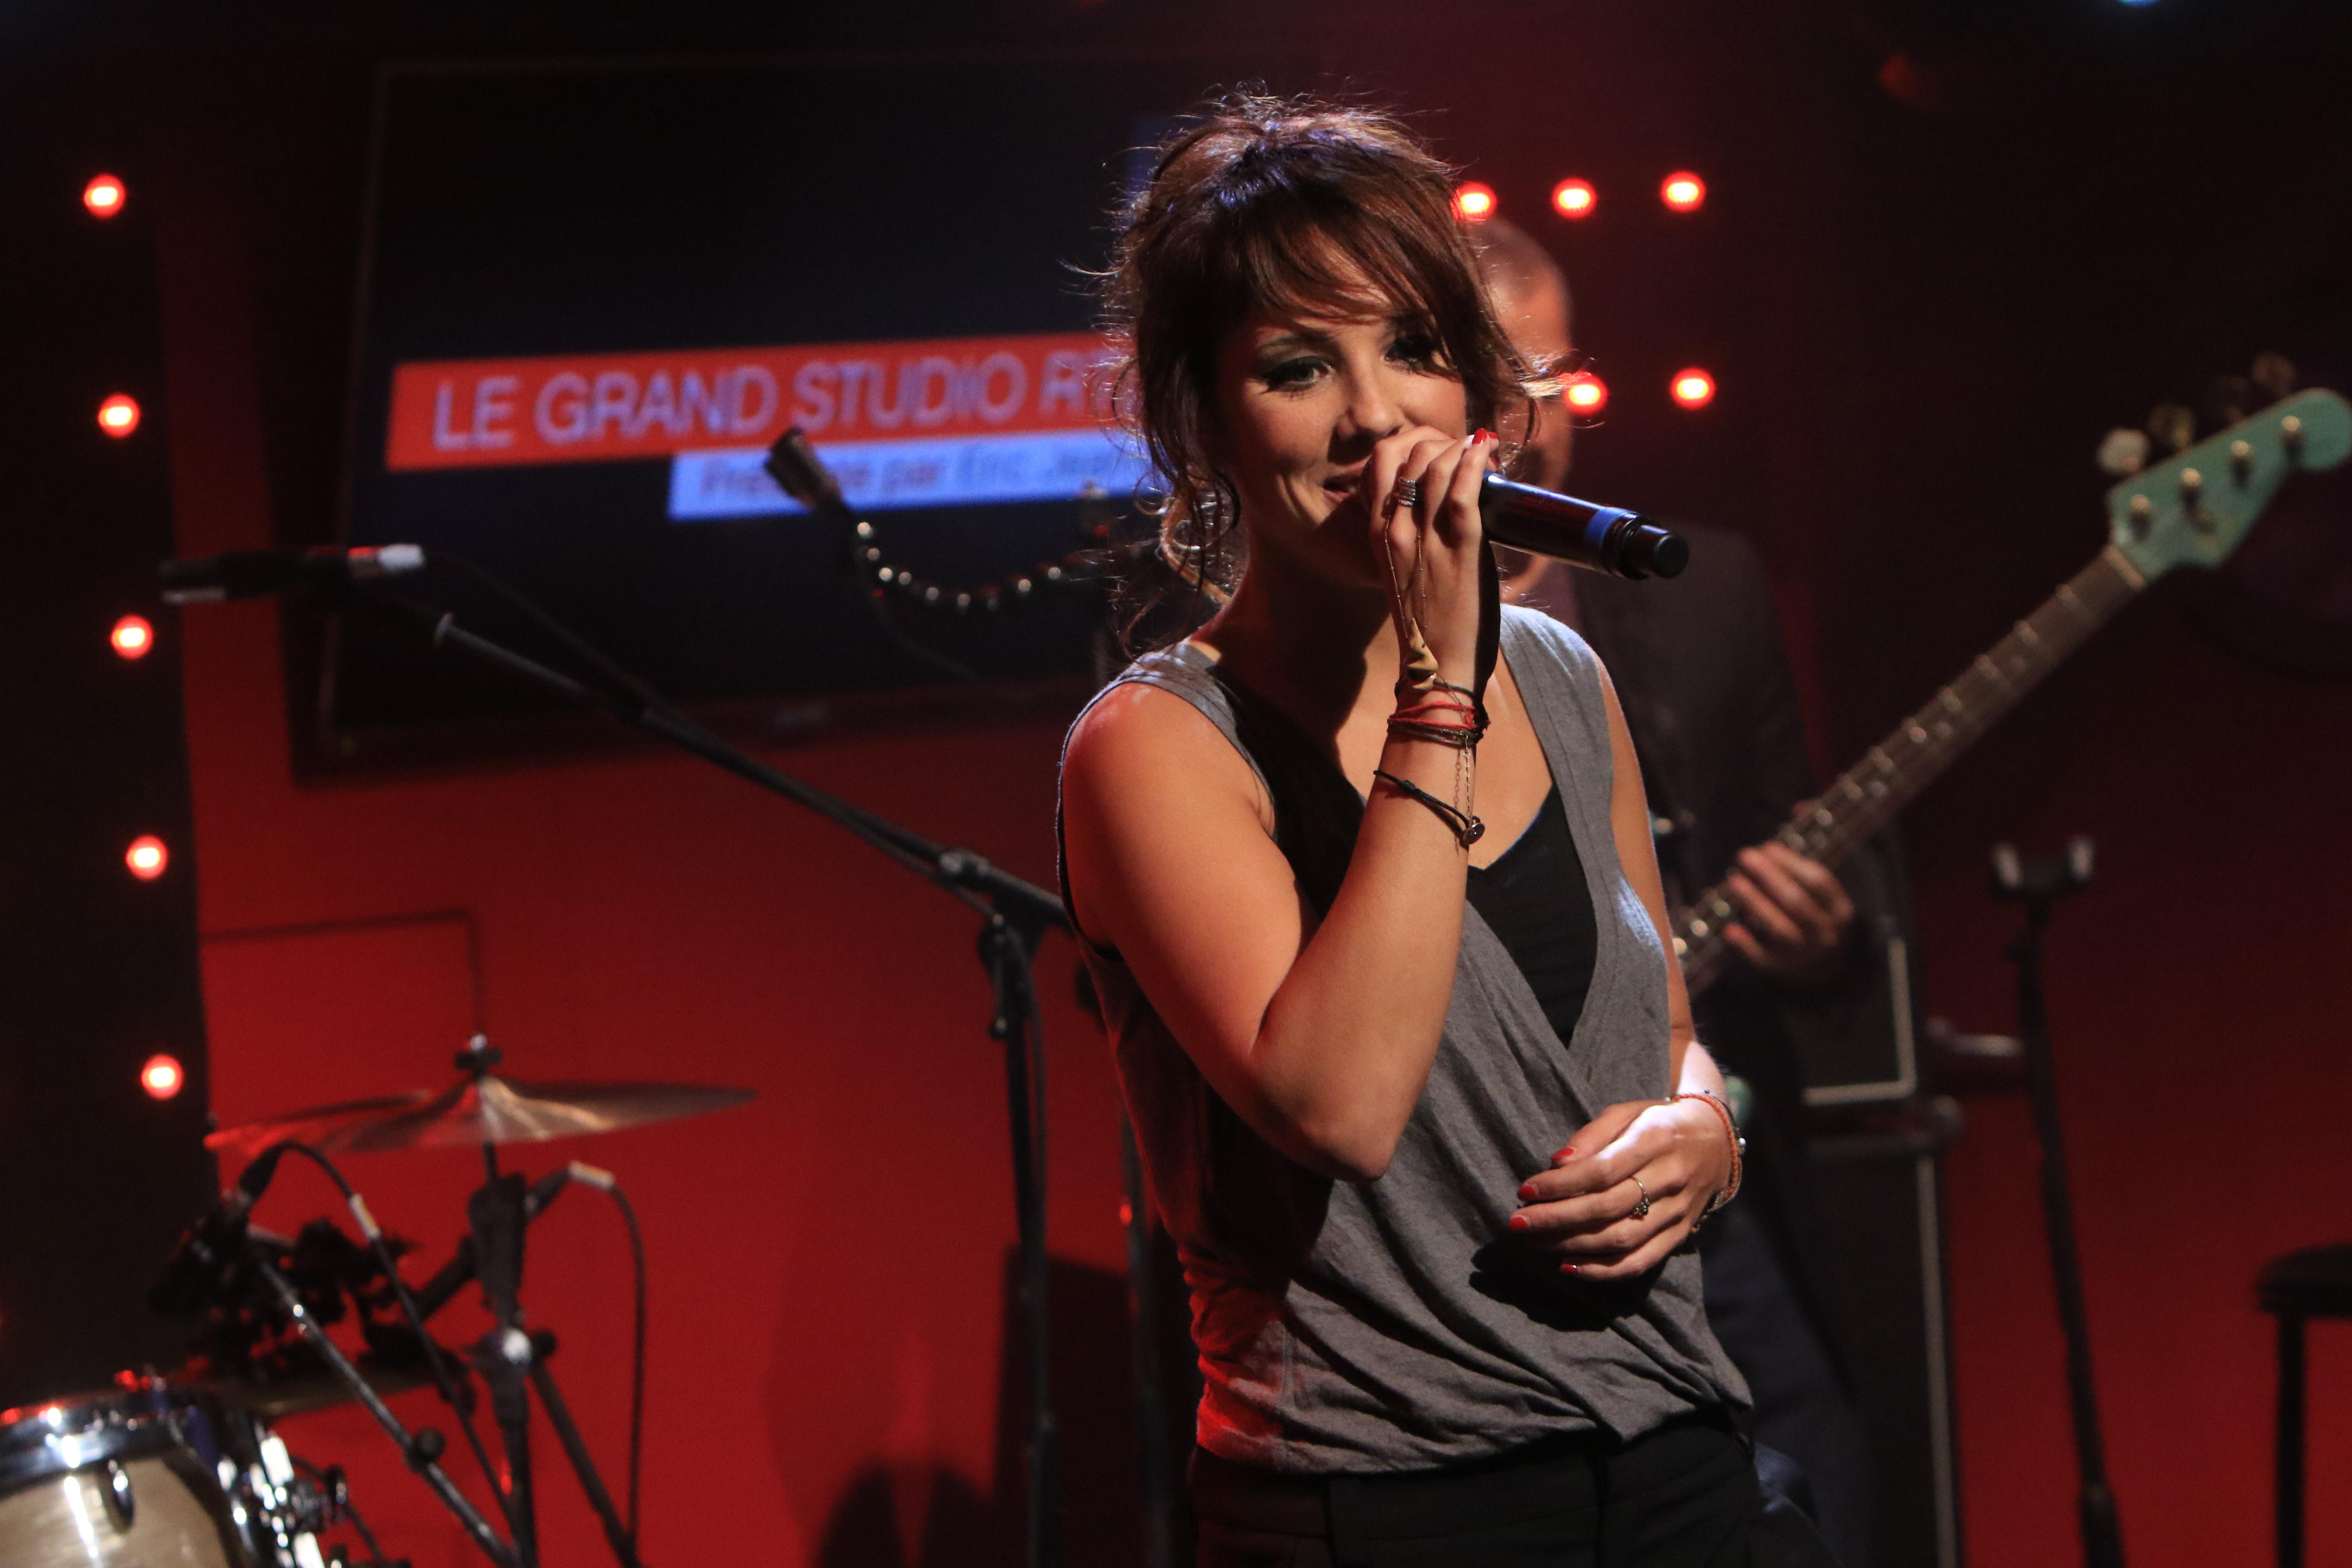 Zaz sera l'une des invitées du Grand Studio RTL © Abaca Press